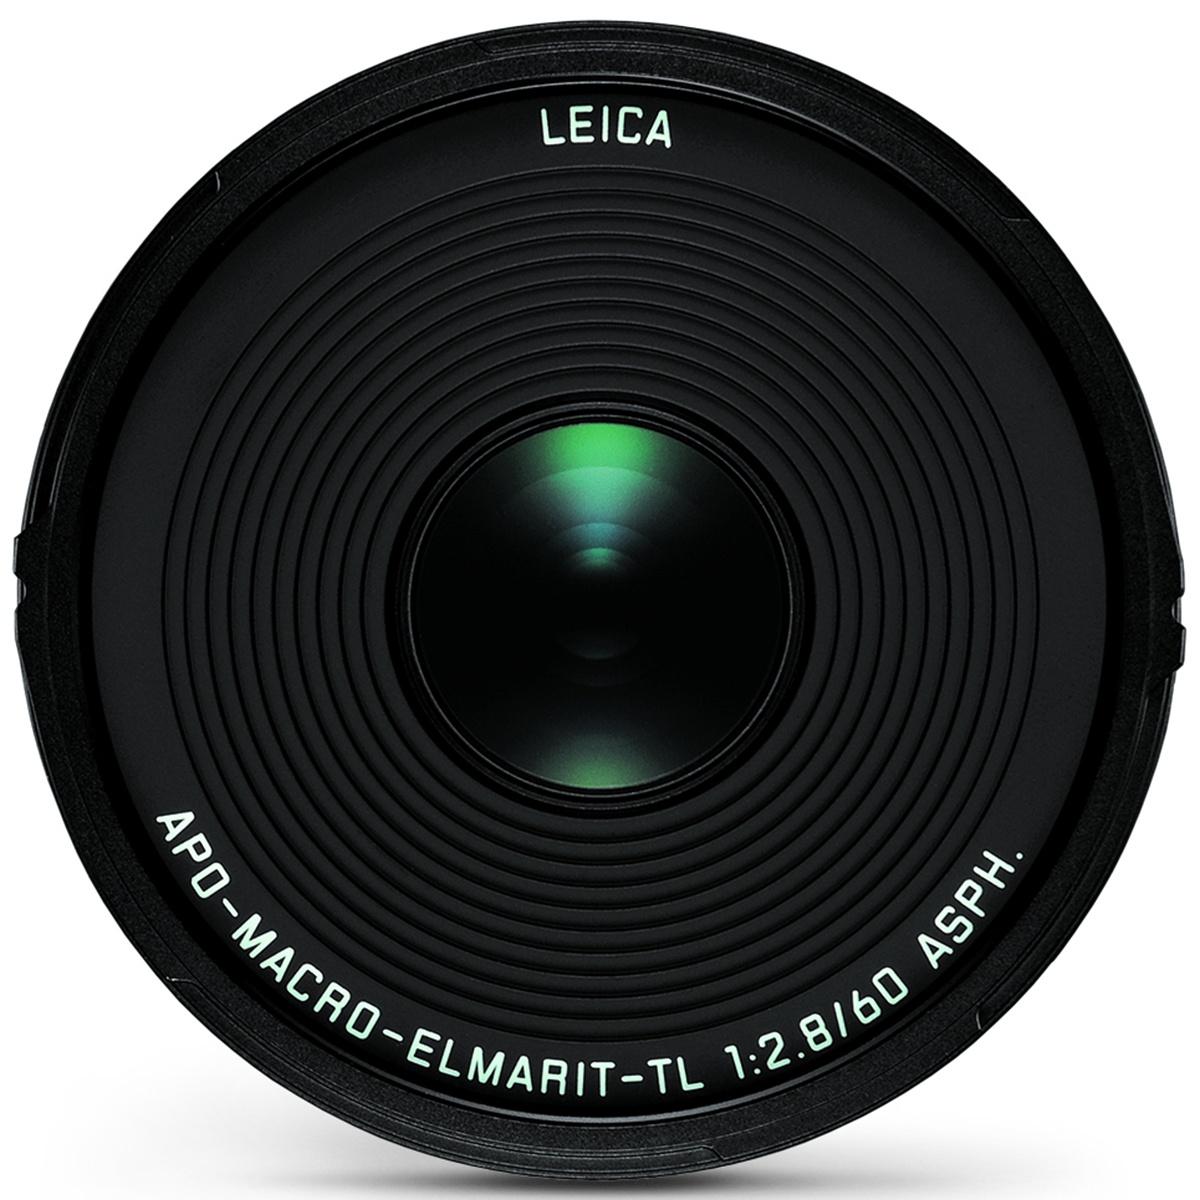 Leica 60 mm 1:2,8 APO-Macro-Elmarit-TL ASPH Schwarz